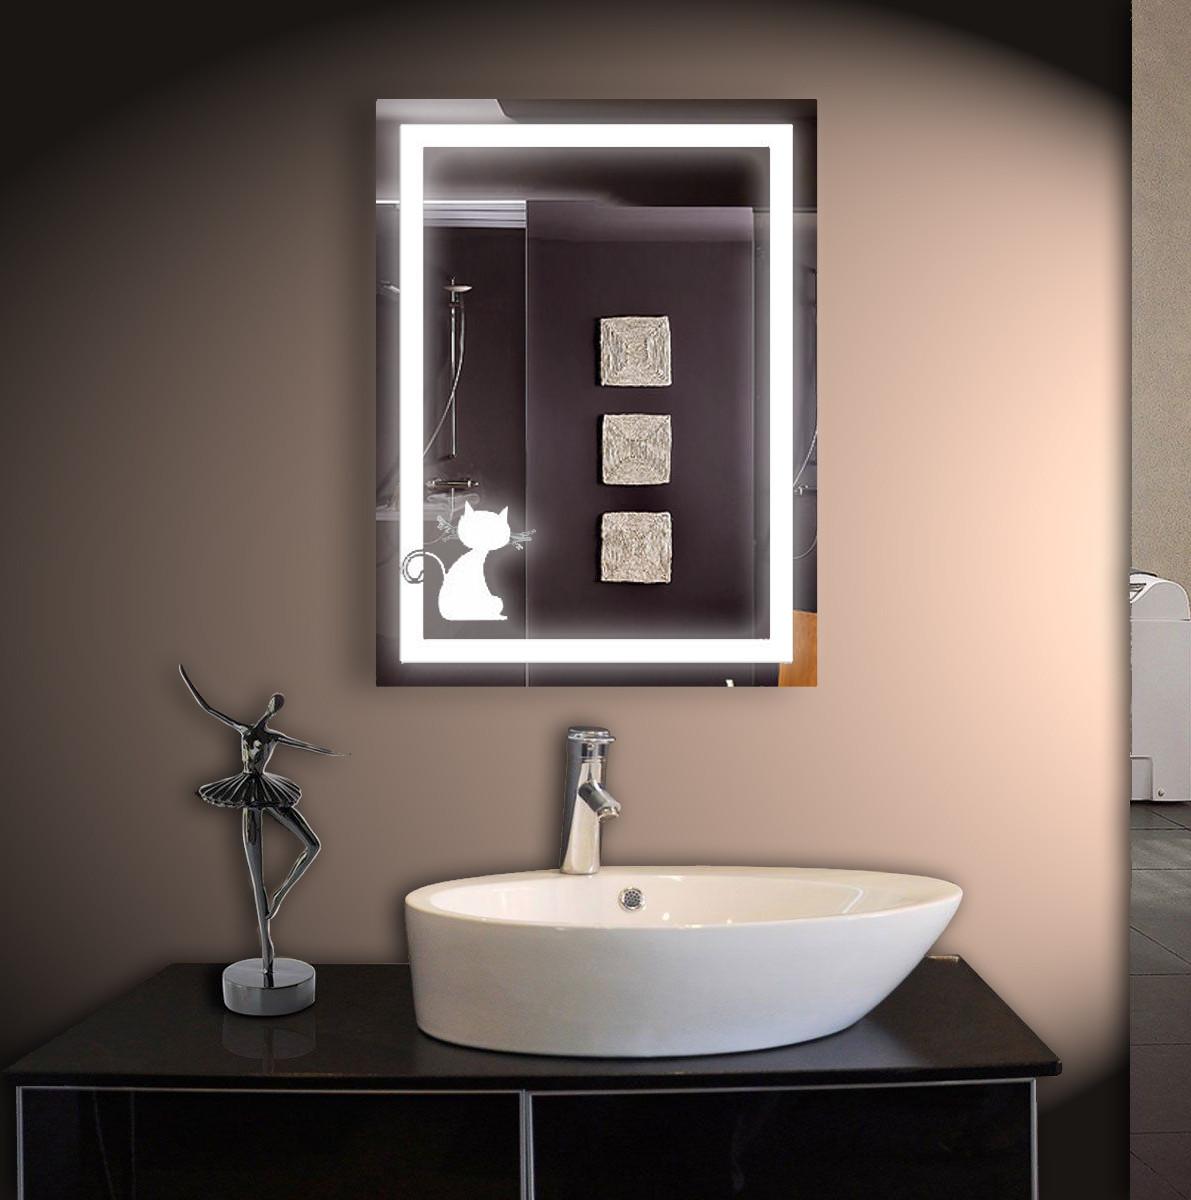 Зеркало LED со светодиодной подсветкой ver-3076 600х800 мм